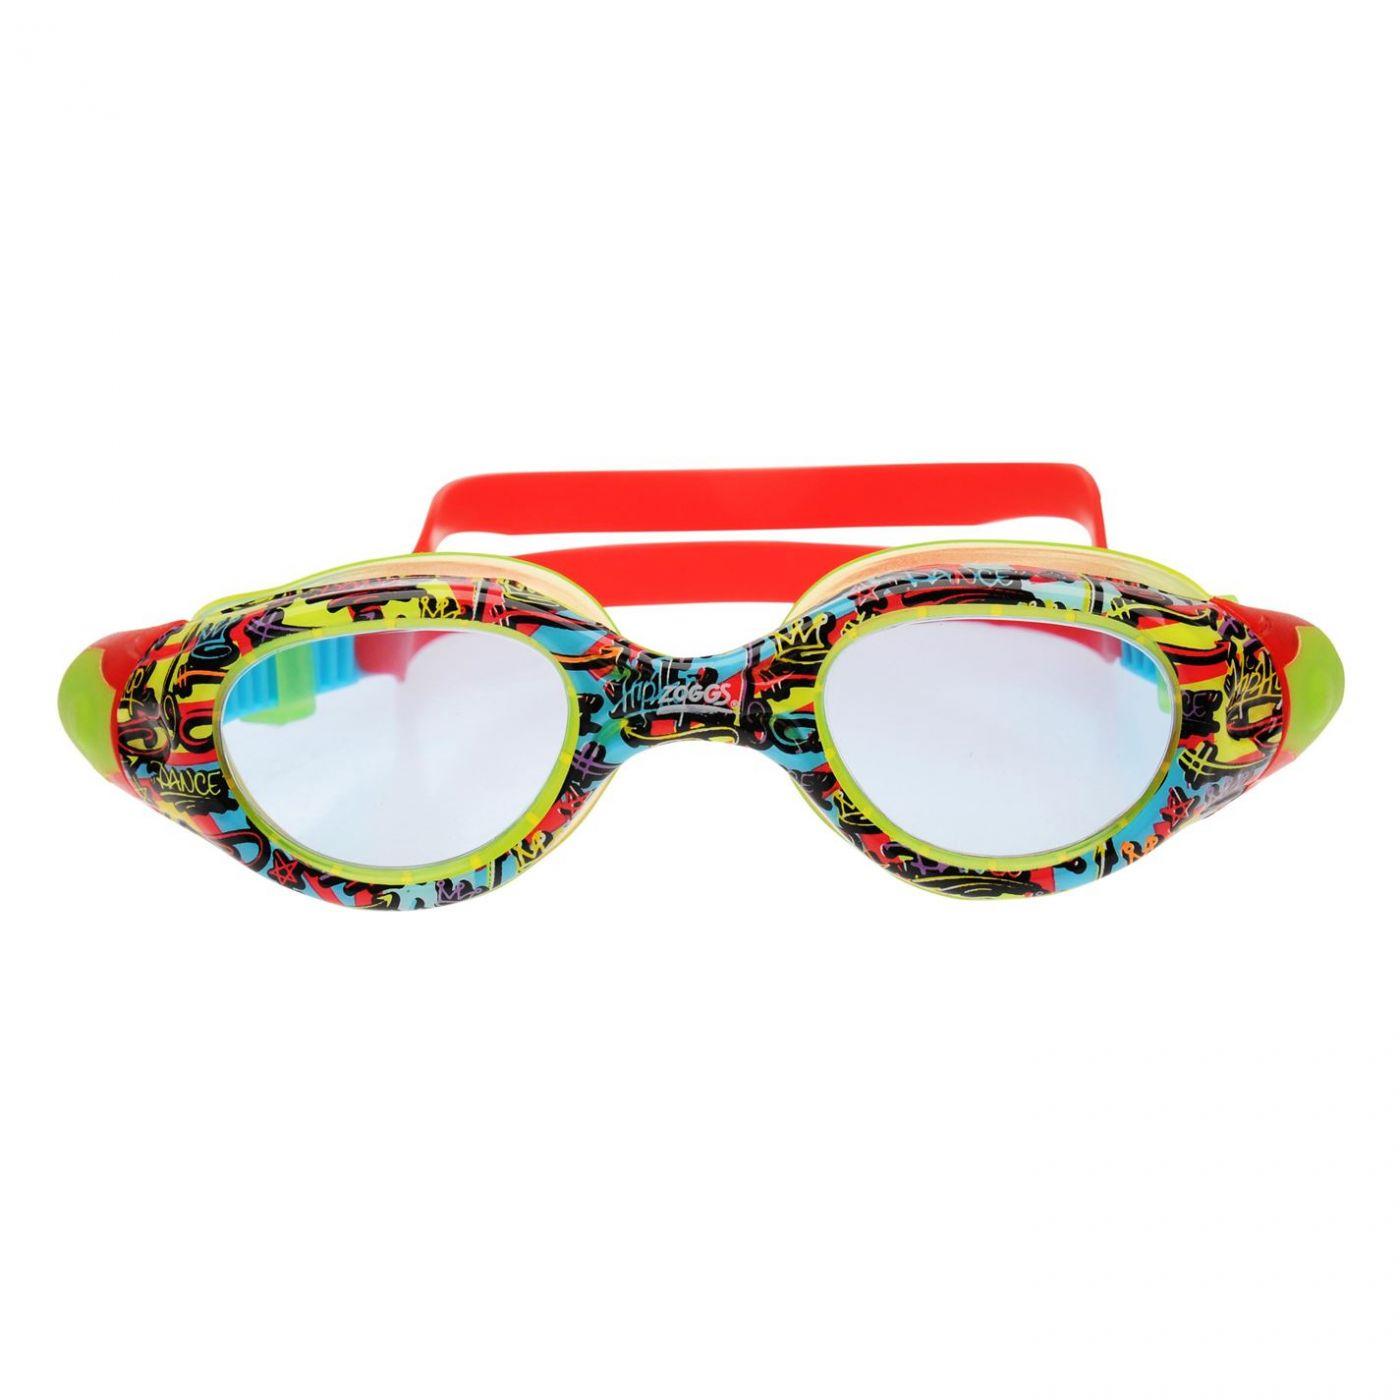 Zoggs Little Comet Swimming Goggles Juniors